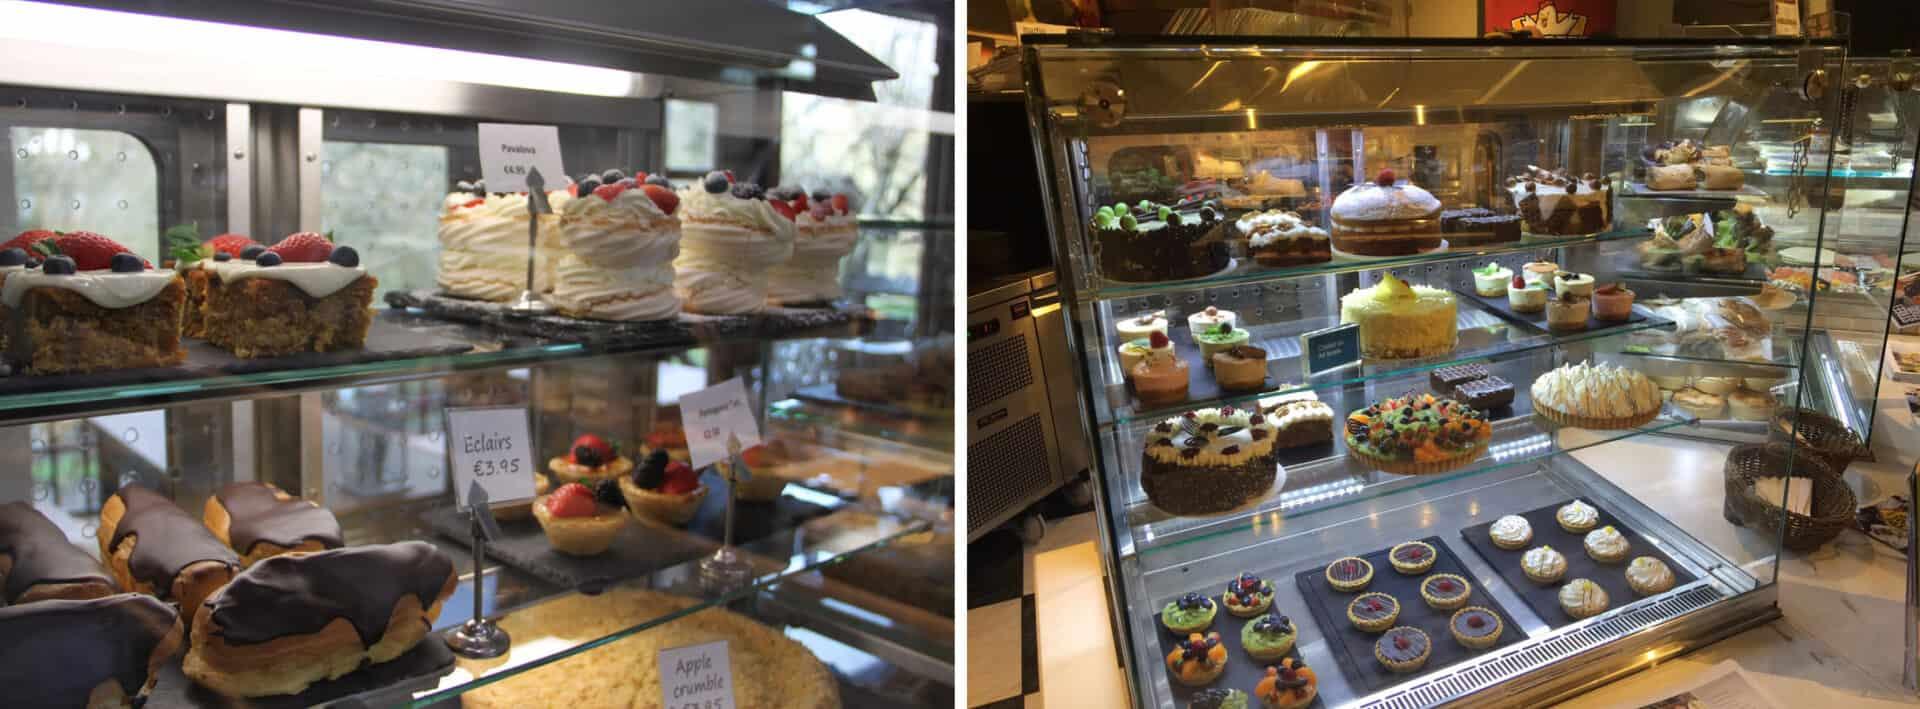 bakery-strip-1